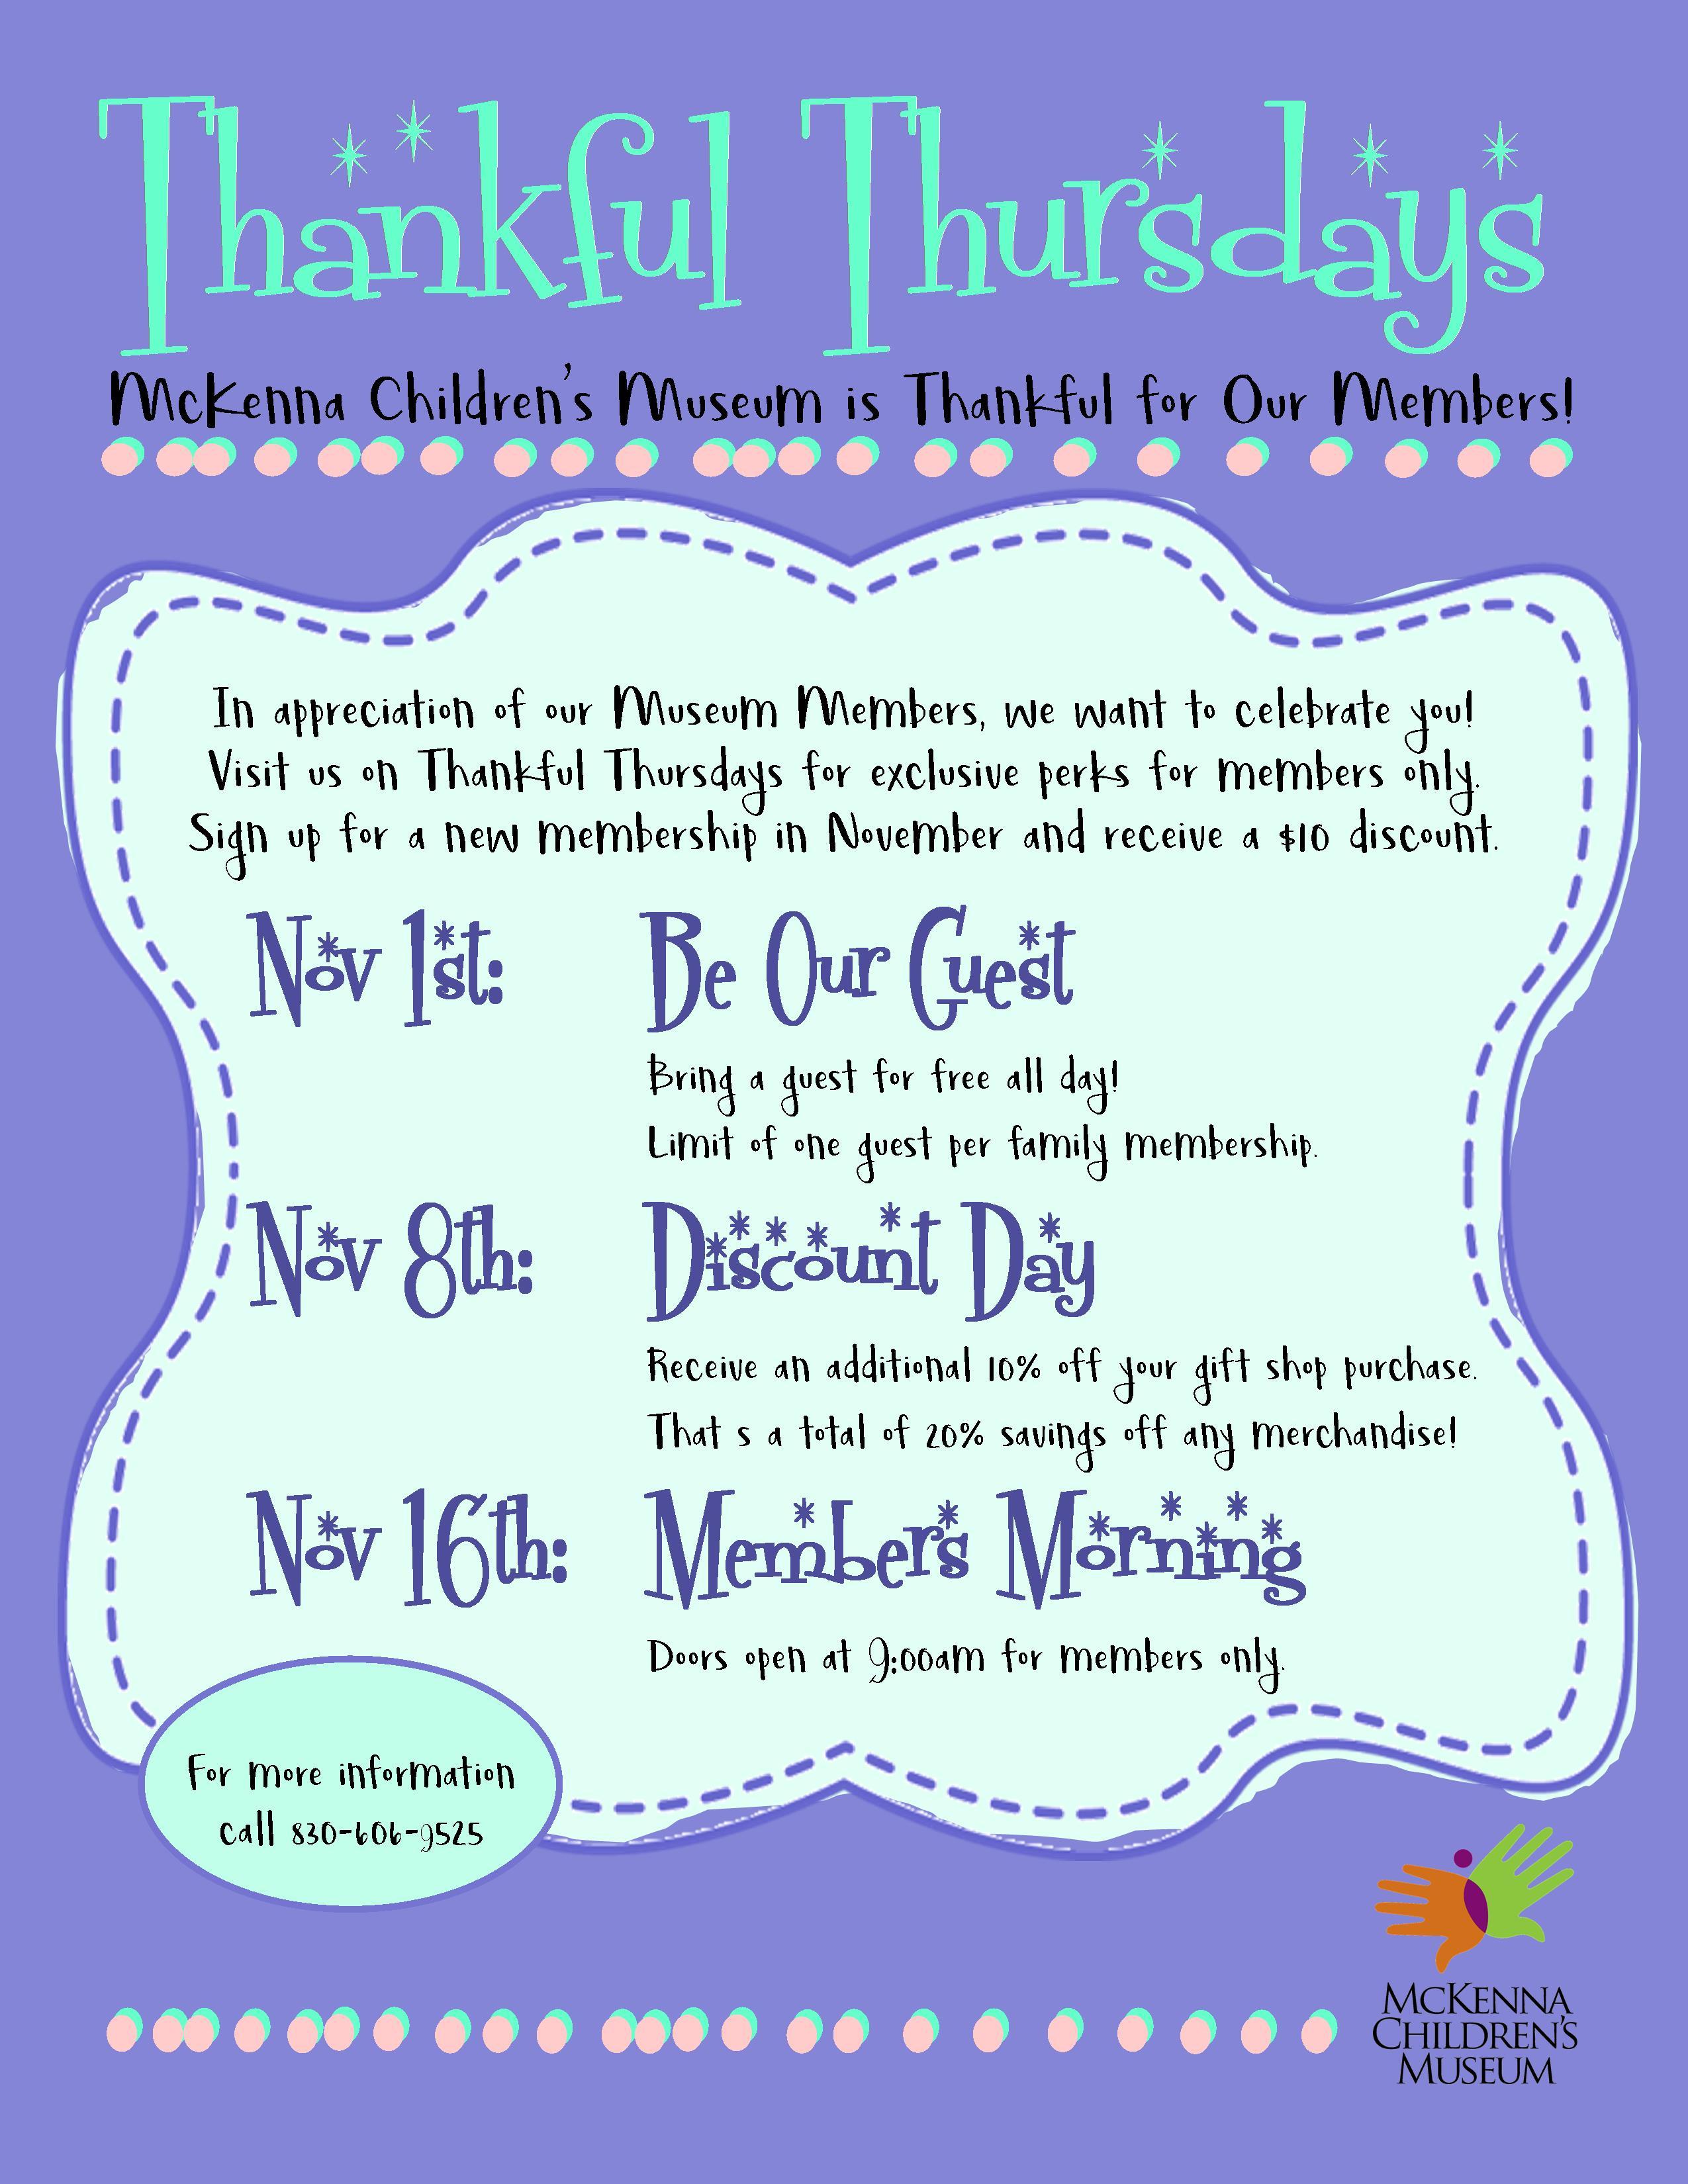 Downtown New Braunfels McKenna Children's Museum Thankful Thursdays